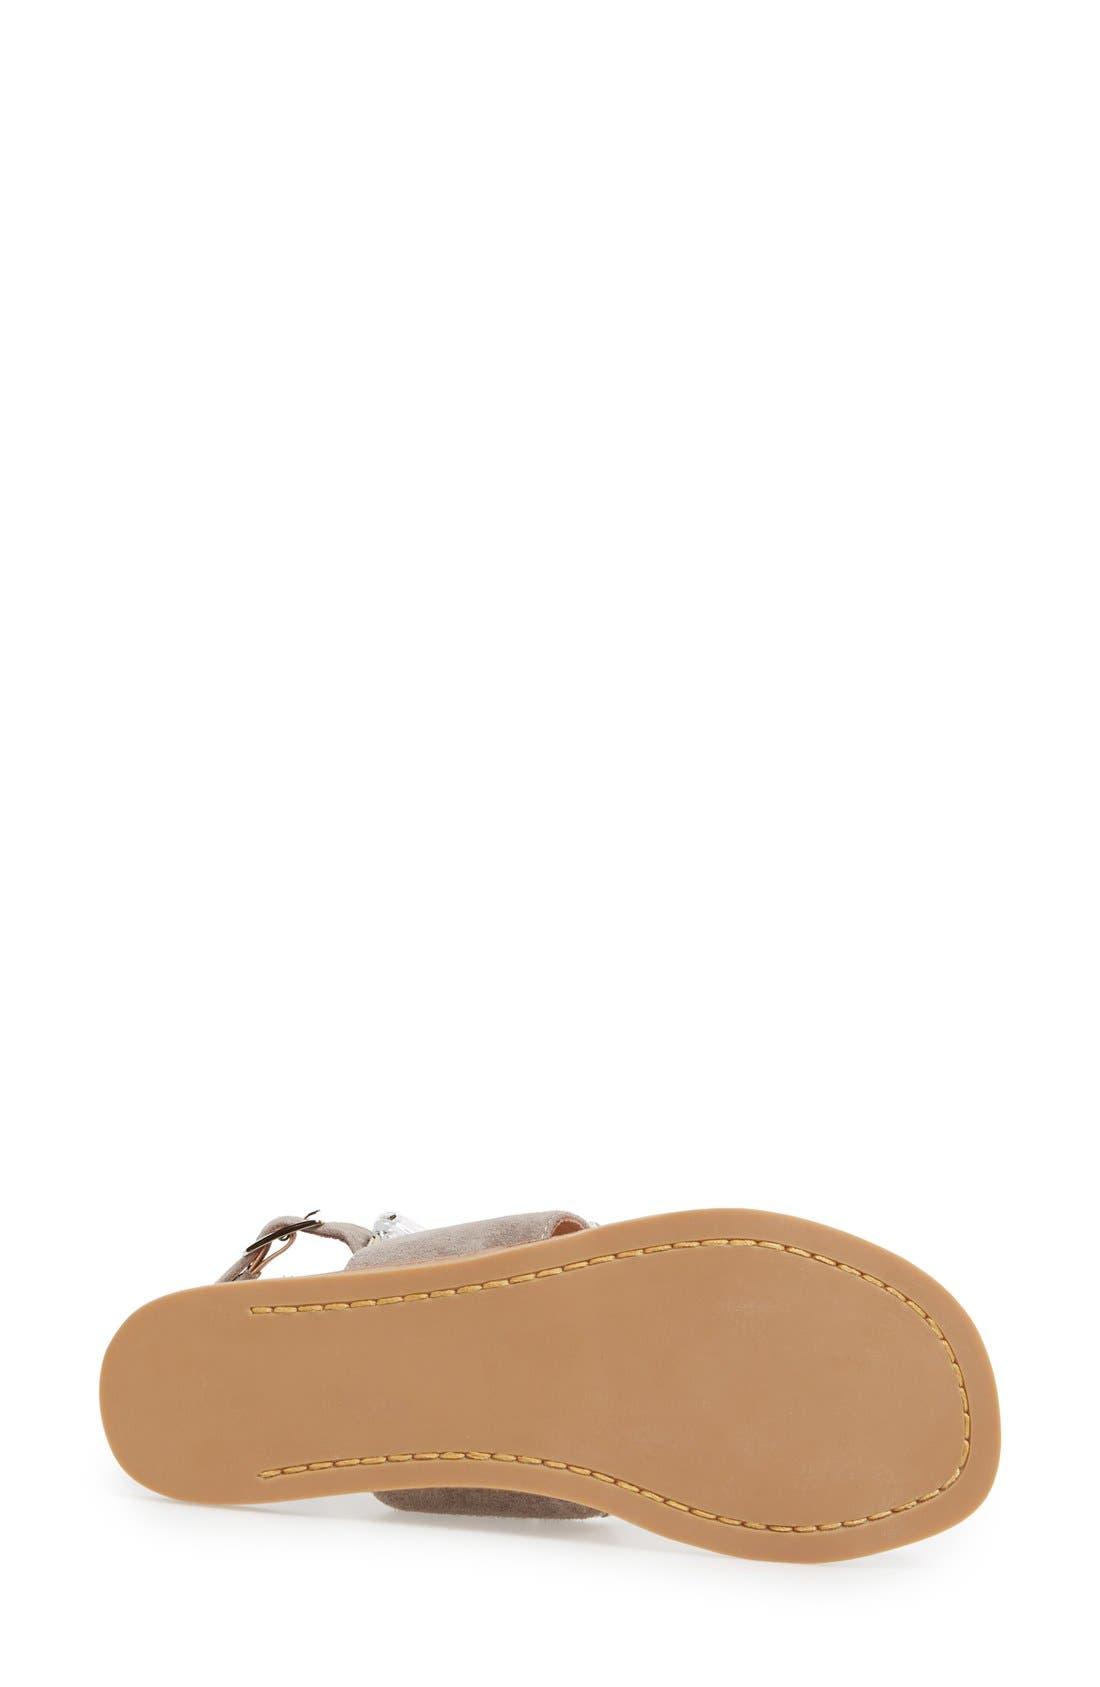 Alternate Image 4  - Jeffrey Campbell 'Sabita' Jeweled Suede Ankle Strap Sandal (Women)